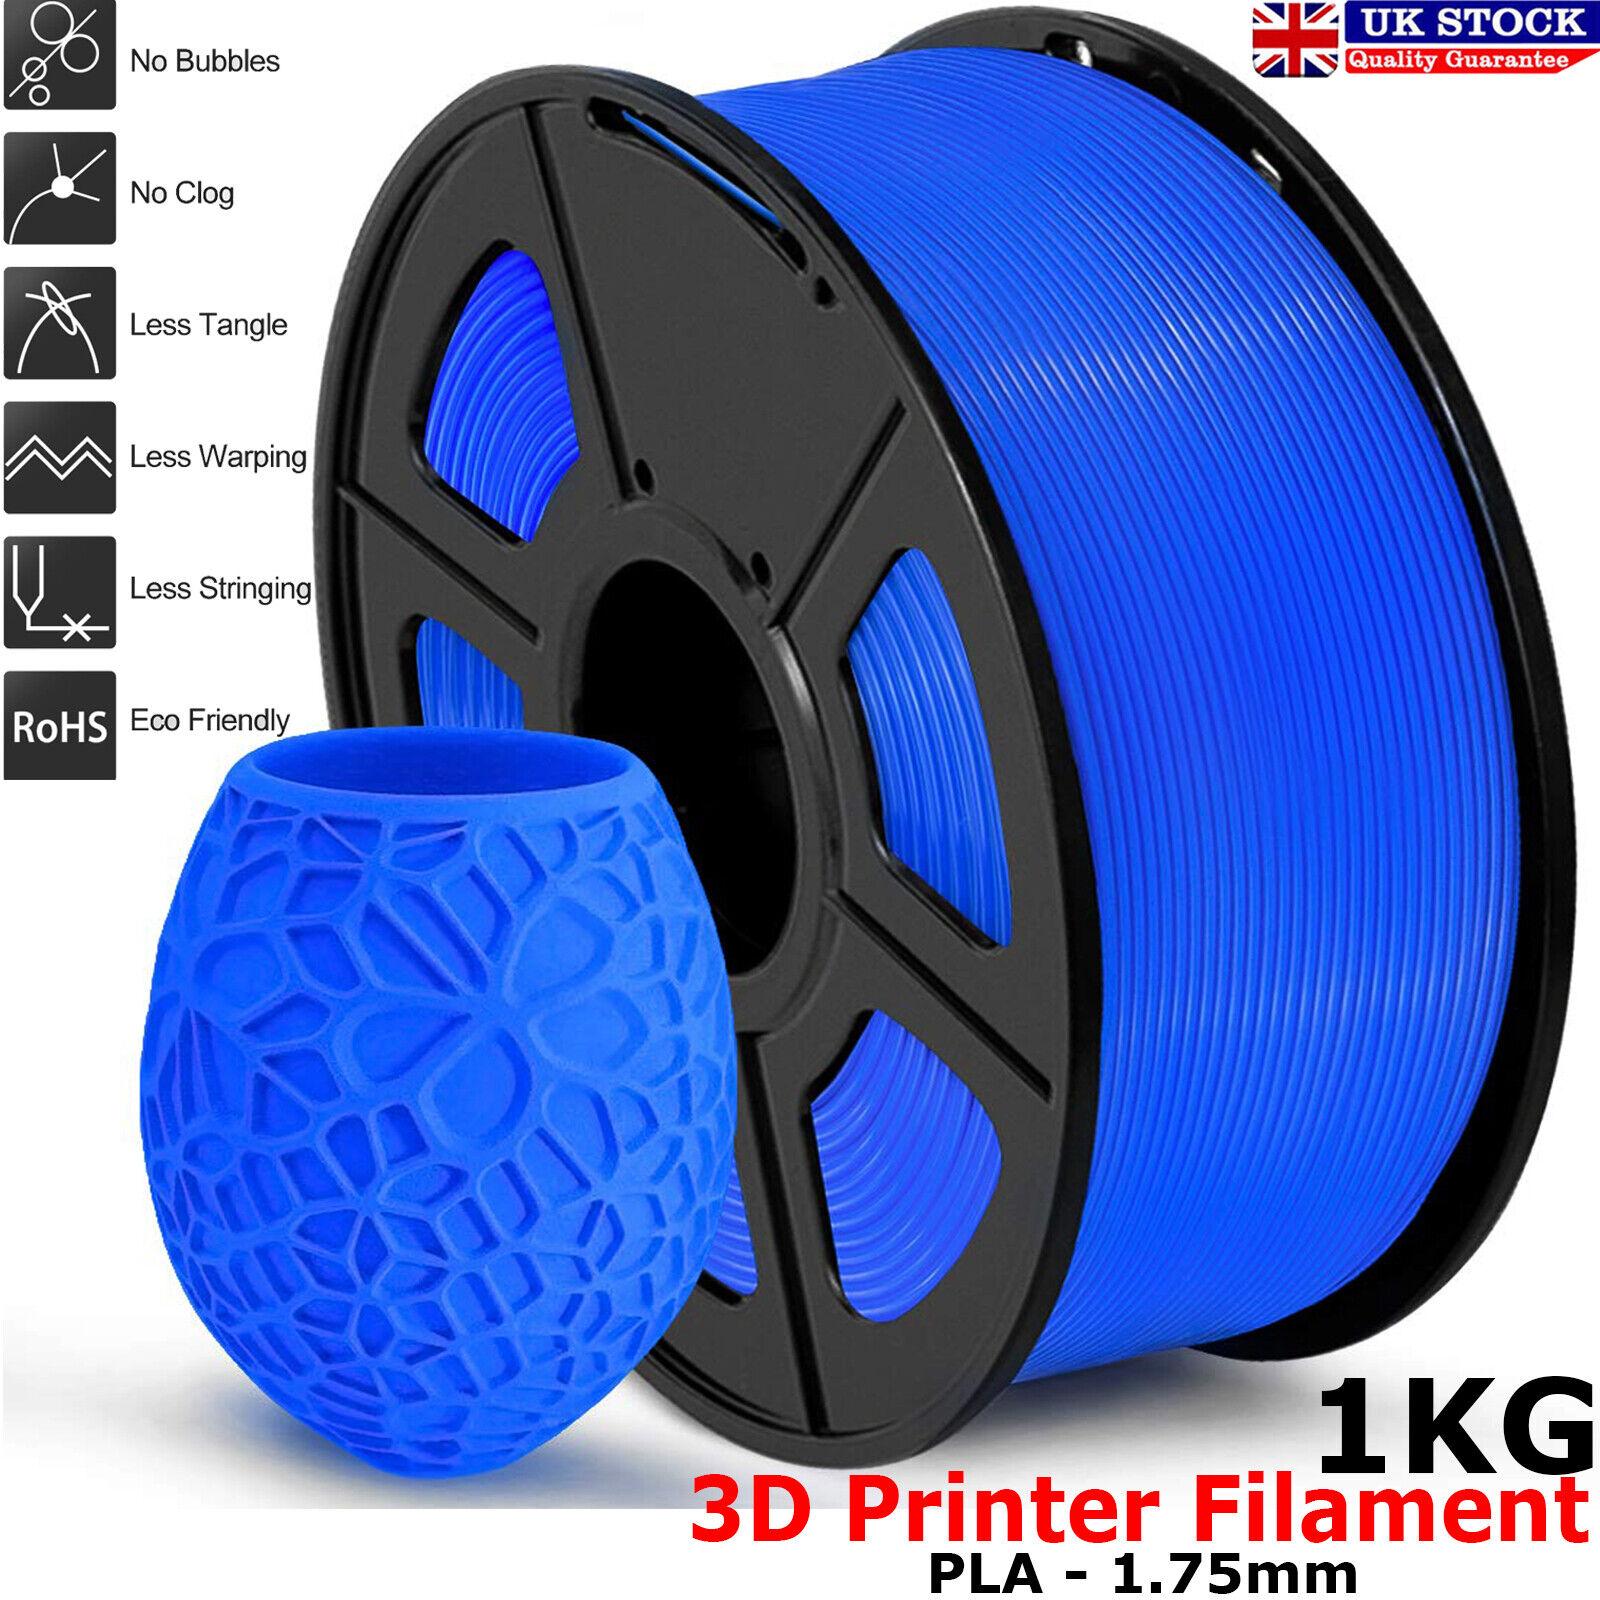 PLA / PETG / PLA+ Silk ABS 3D Printer Filament 1KG 1.75mm Accuracy+/-0.02mm UK